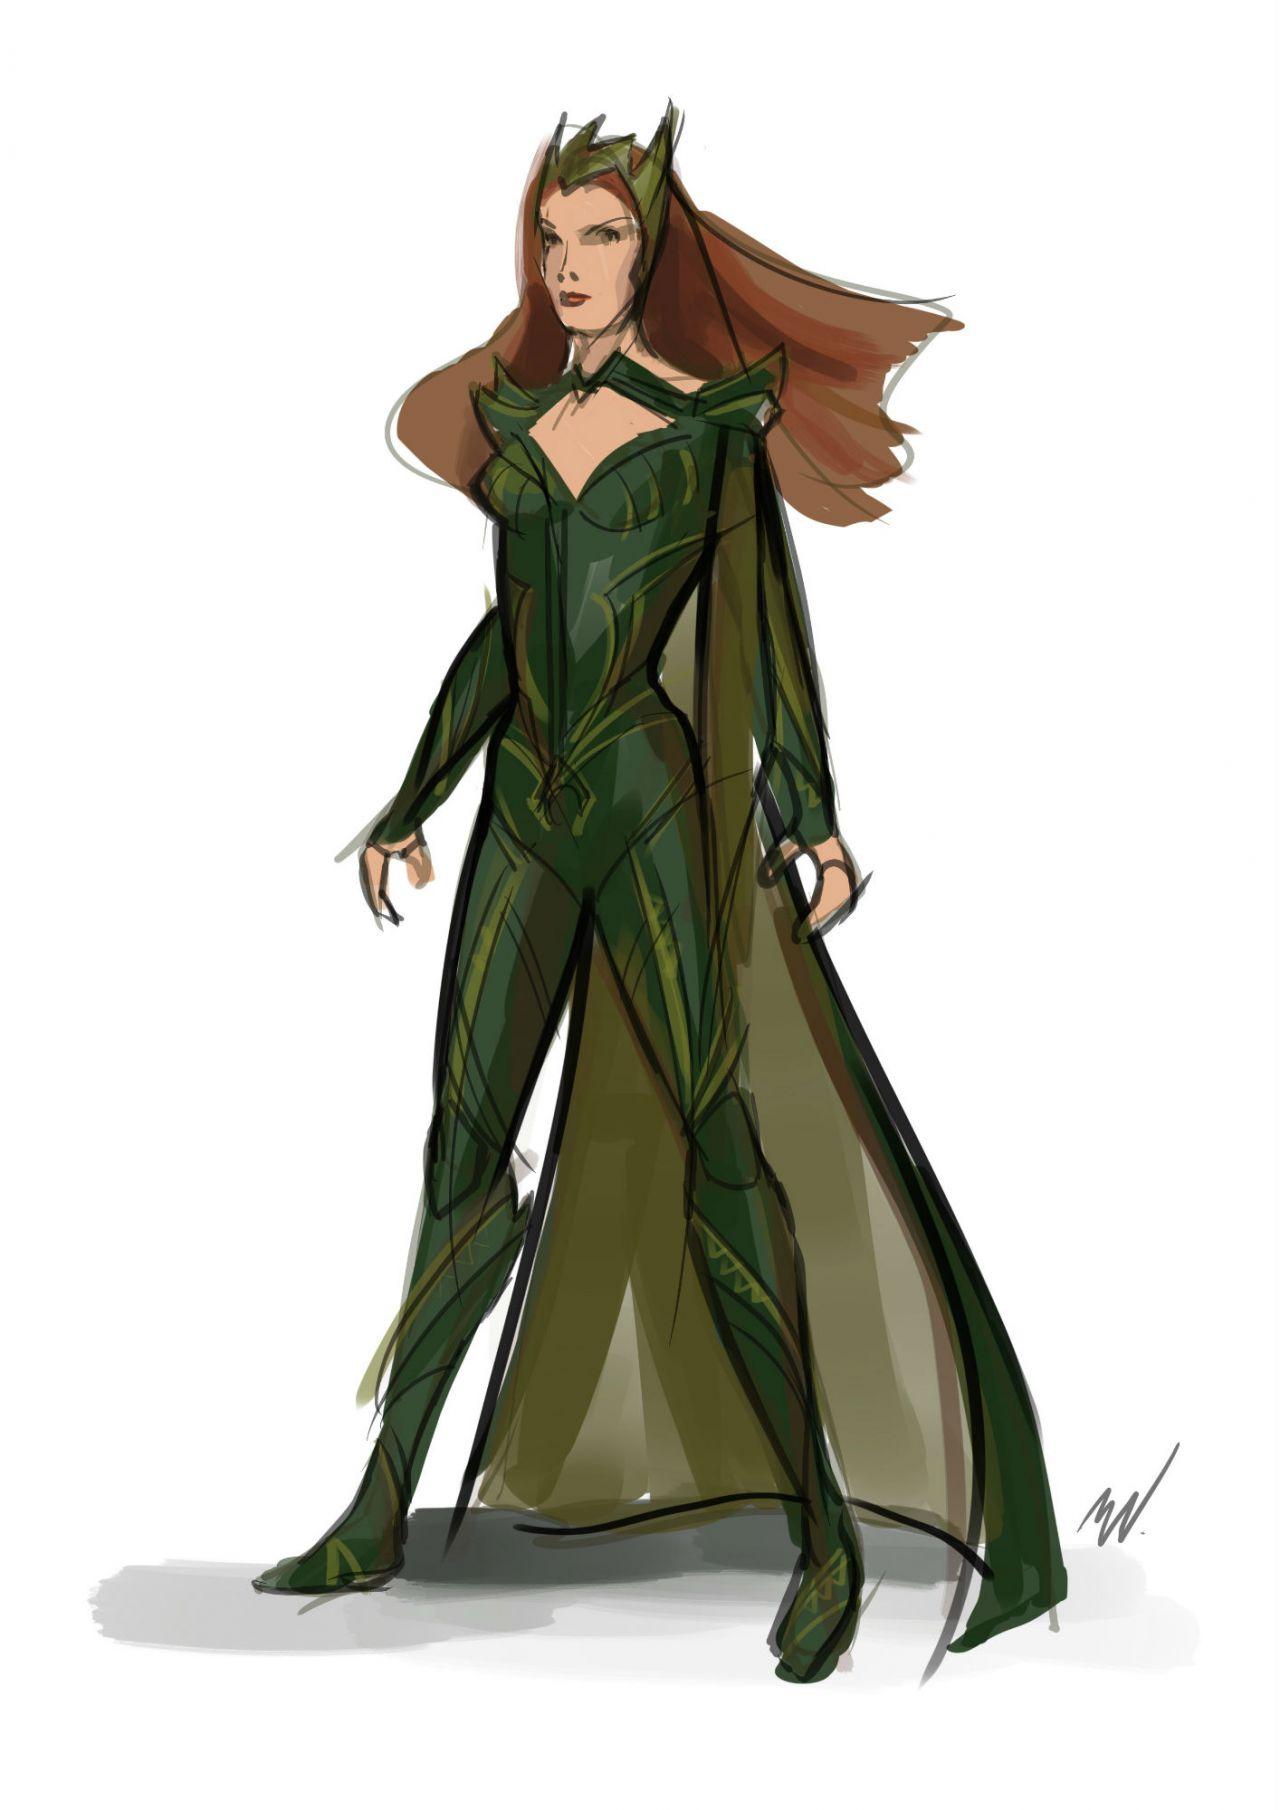 Sketch Art of Mera in Justice League